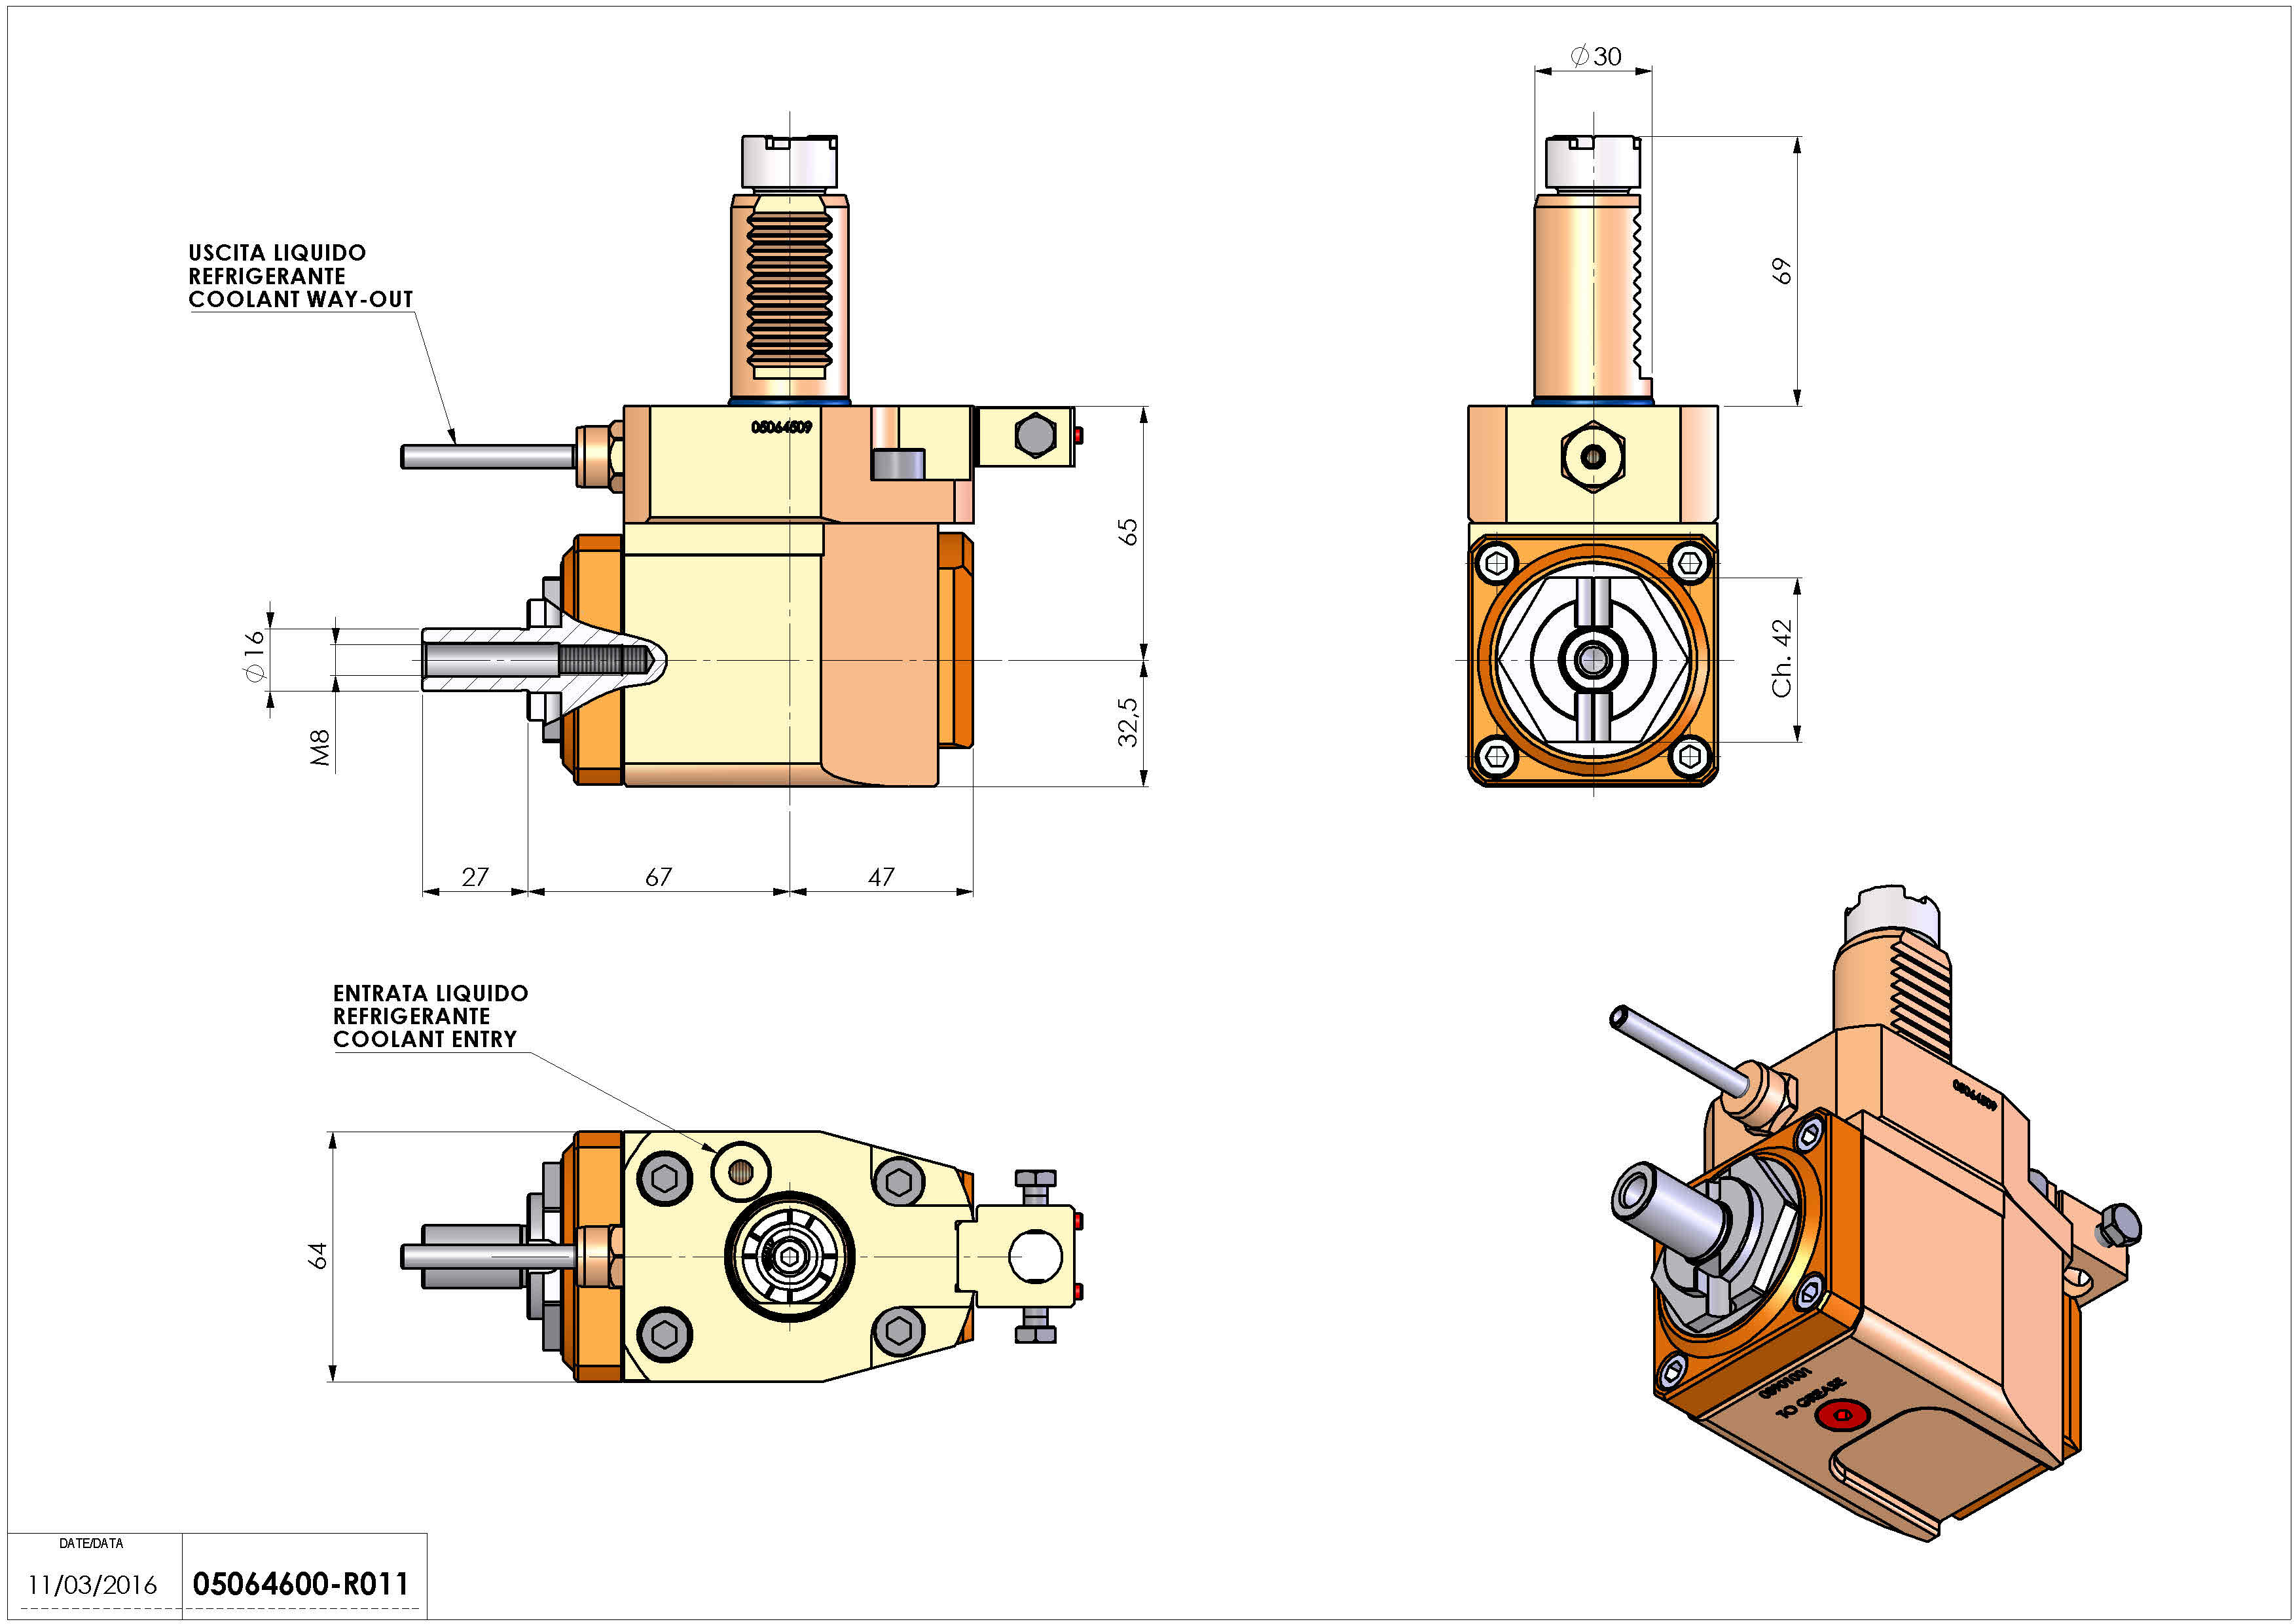 Technical image - LT-A VDI30 DIN138-16 R H65 OK.